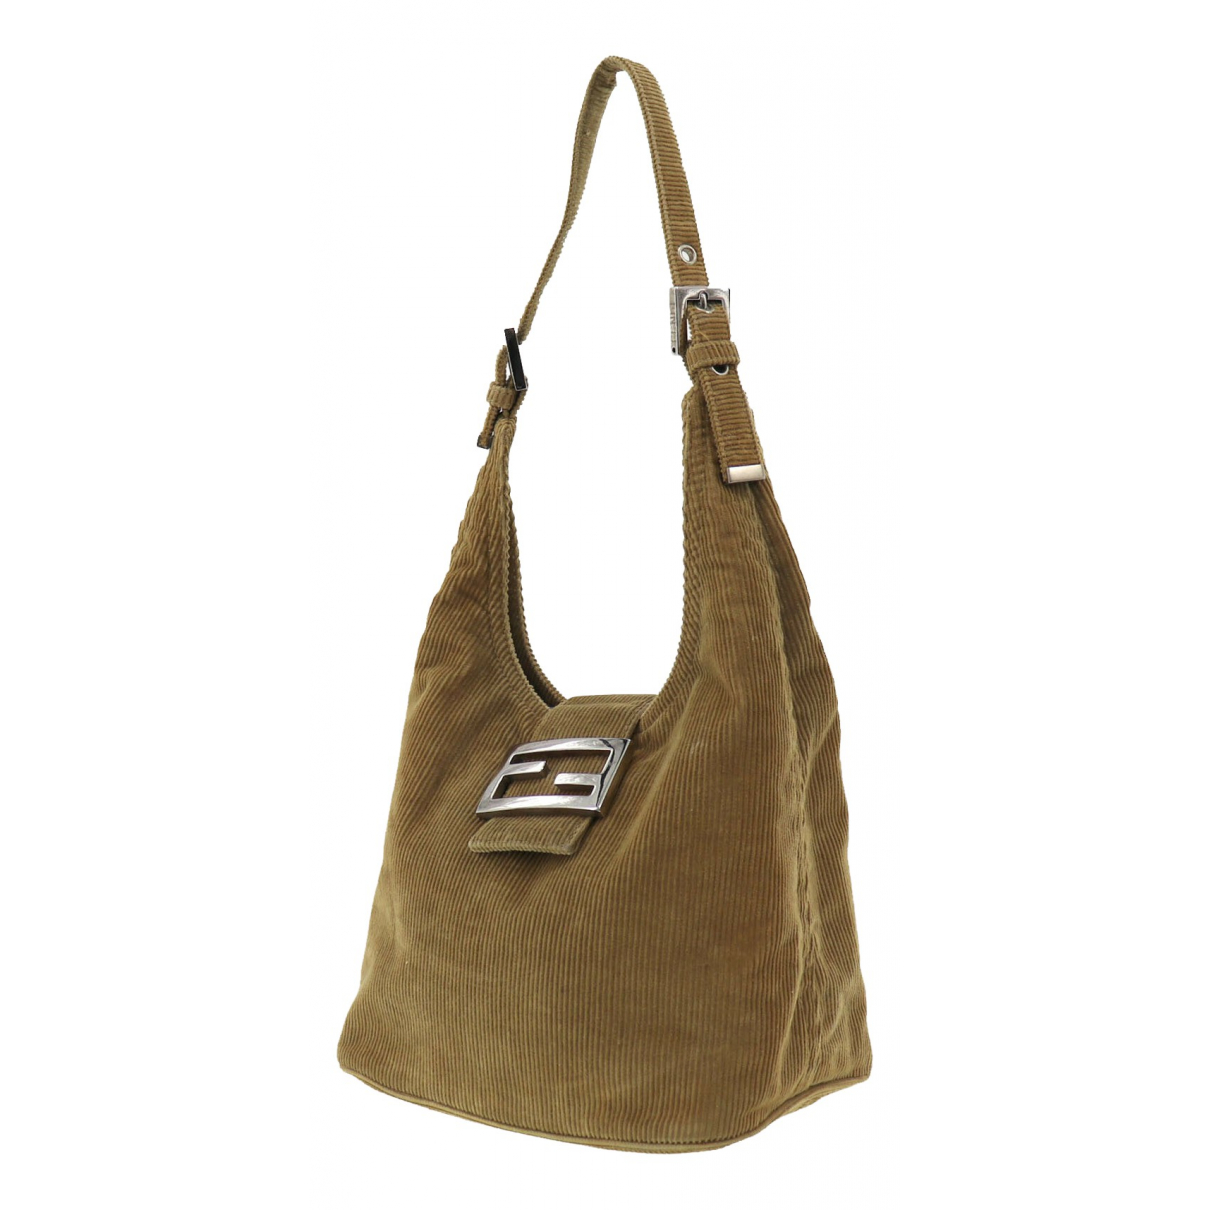 Fendi \N Handtasche in  Beige Samt